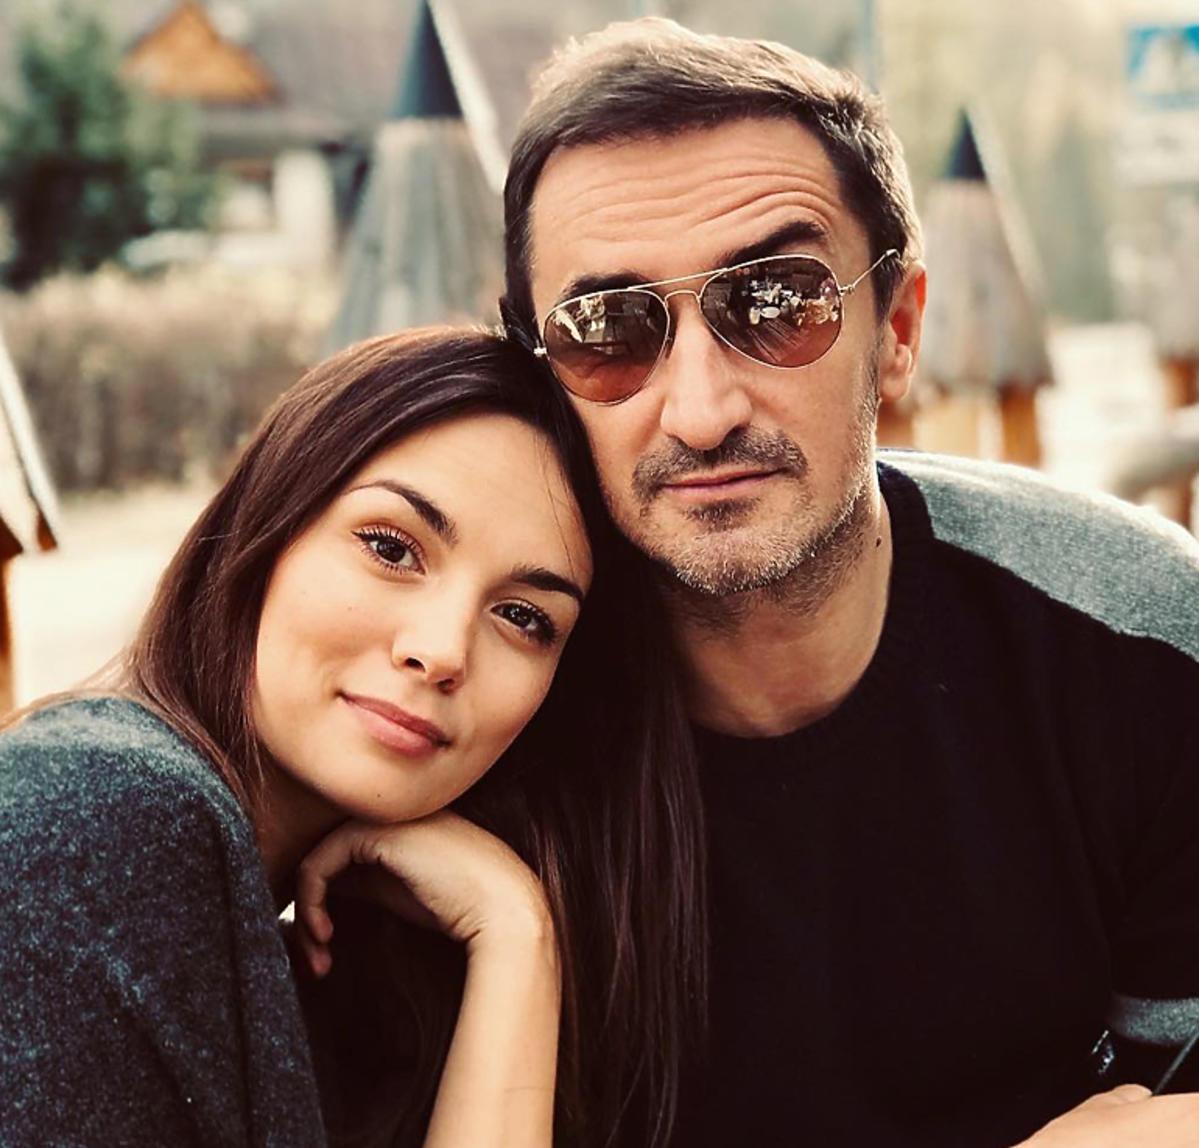 Paulina Krupińska i Sebastian Karpiel-Bułecka na Instagramie